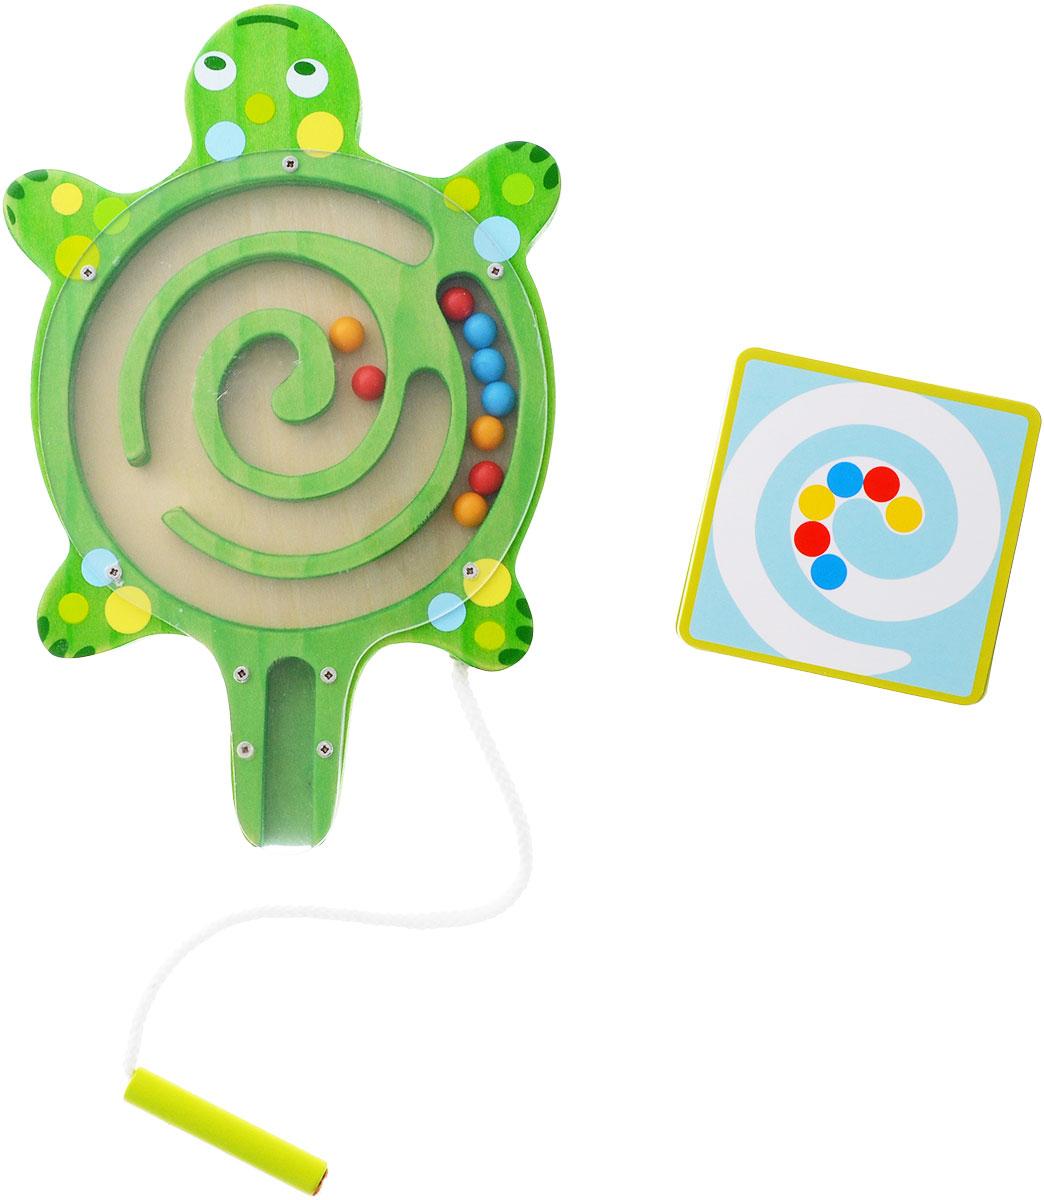 все цены на Djeco Развивающая игрушка Лабиринт Черепаха онлайн